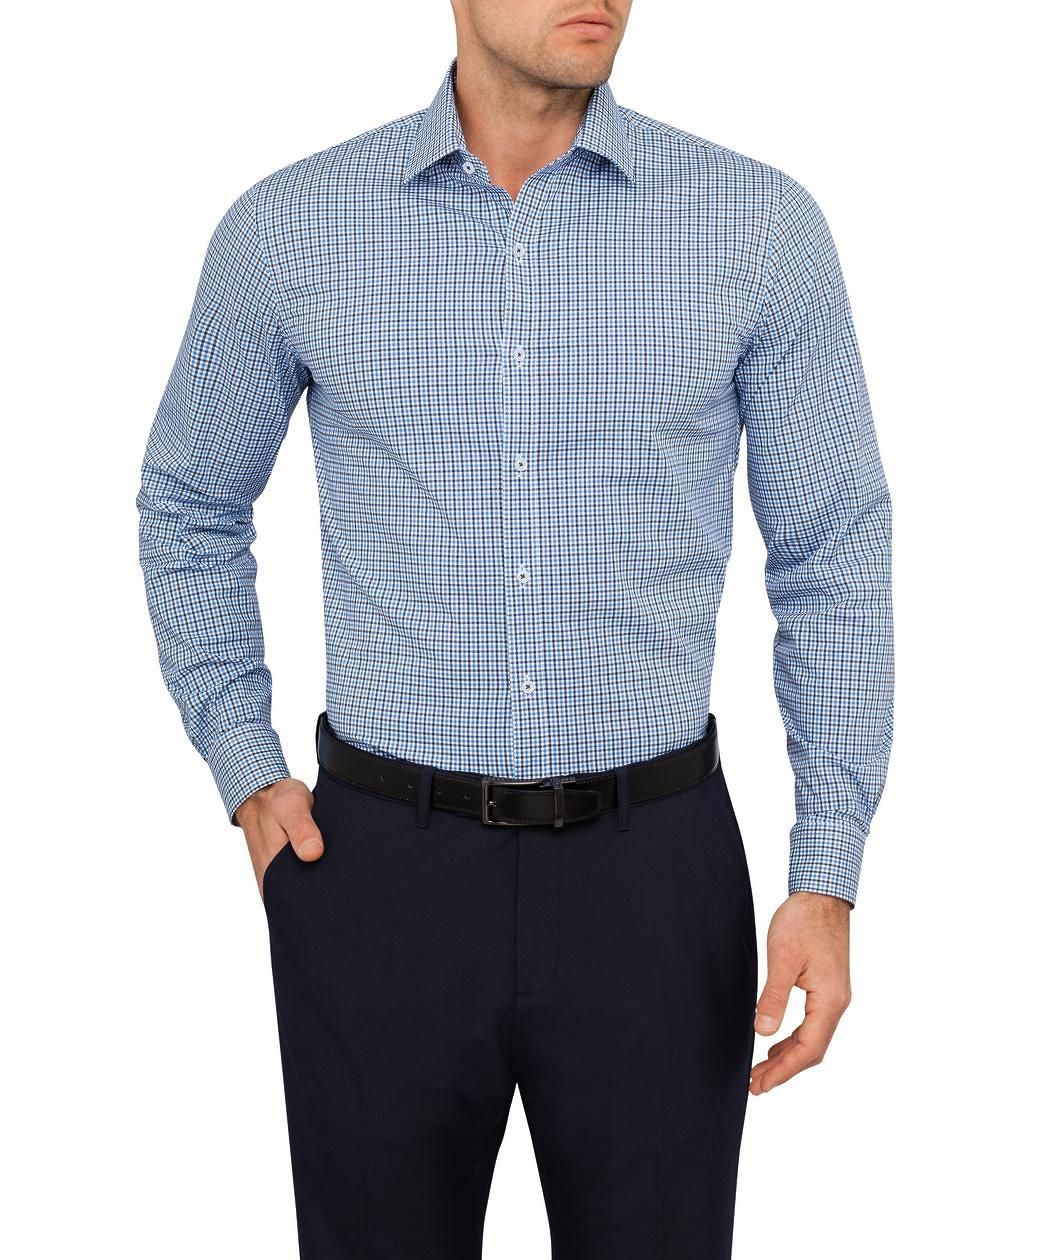 Van Heusen Slim Fit Shirt Navy Black Check Mens Business